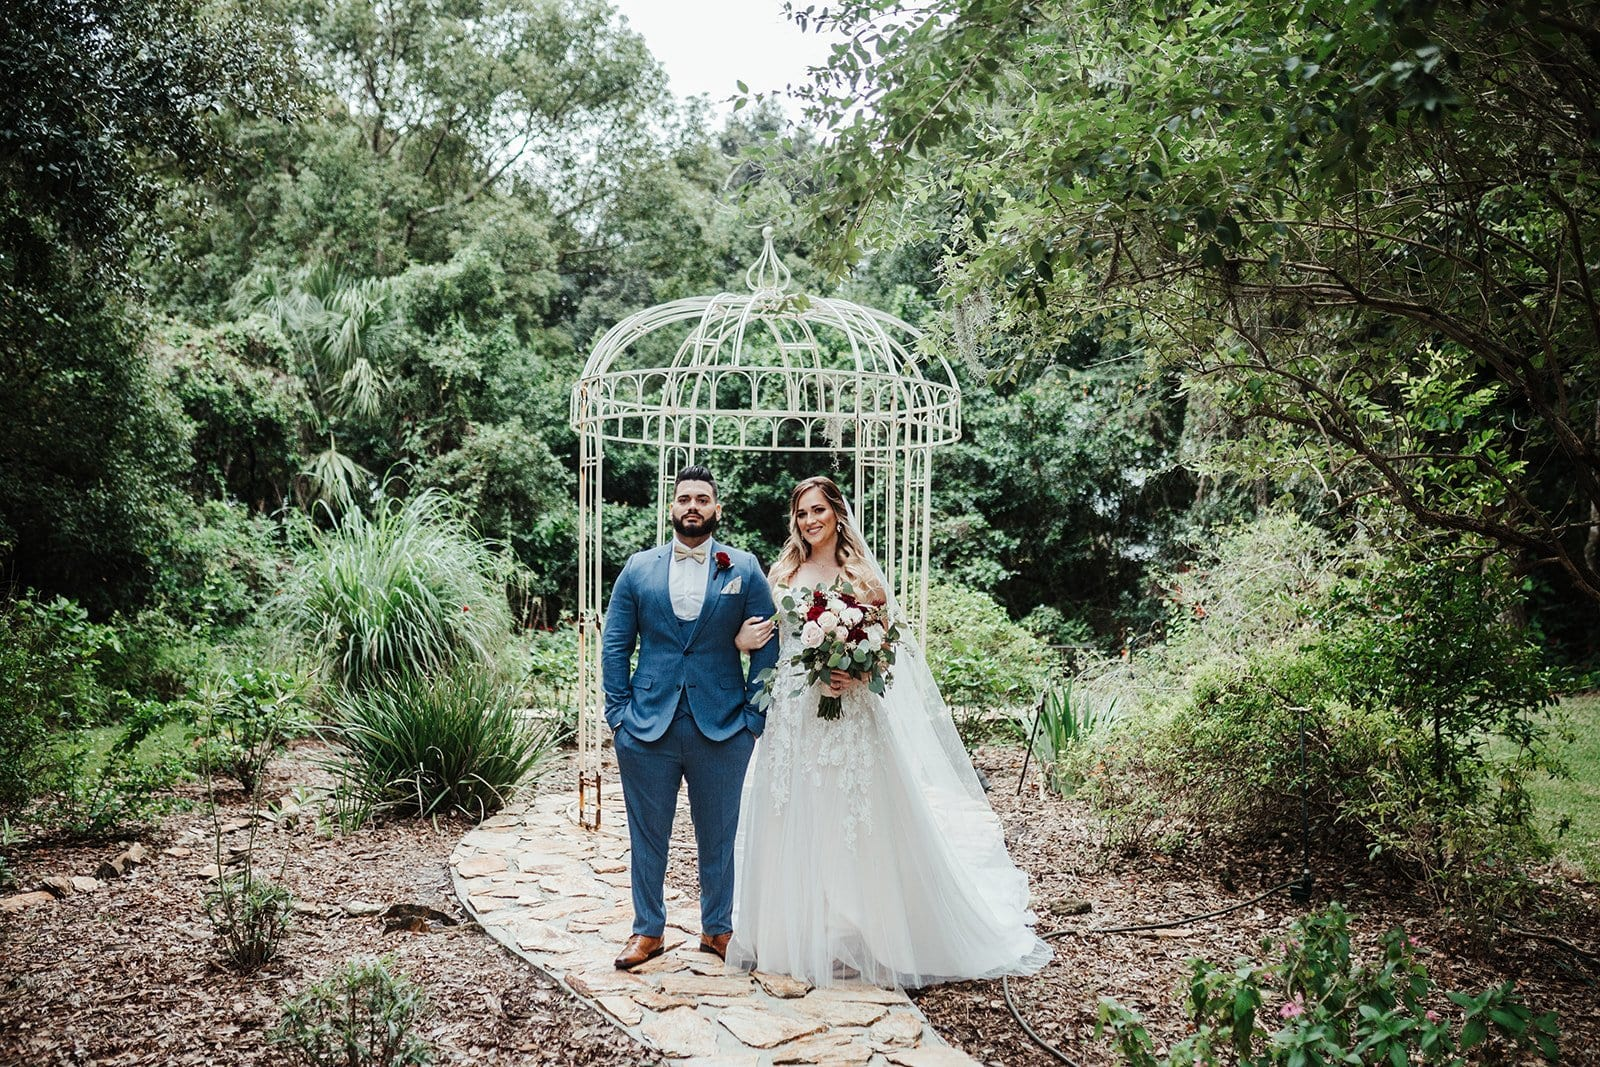 Nina + Carlos's Elegant and Traditional Garden Wedding